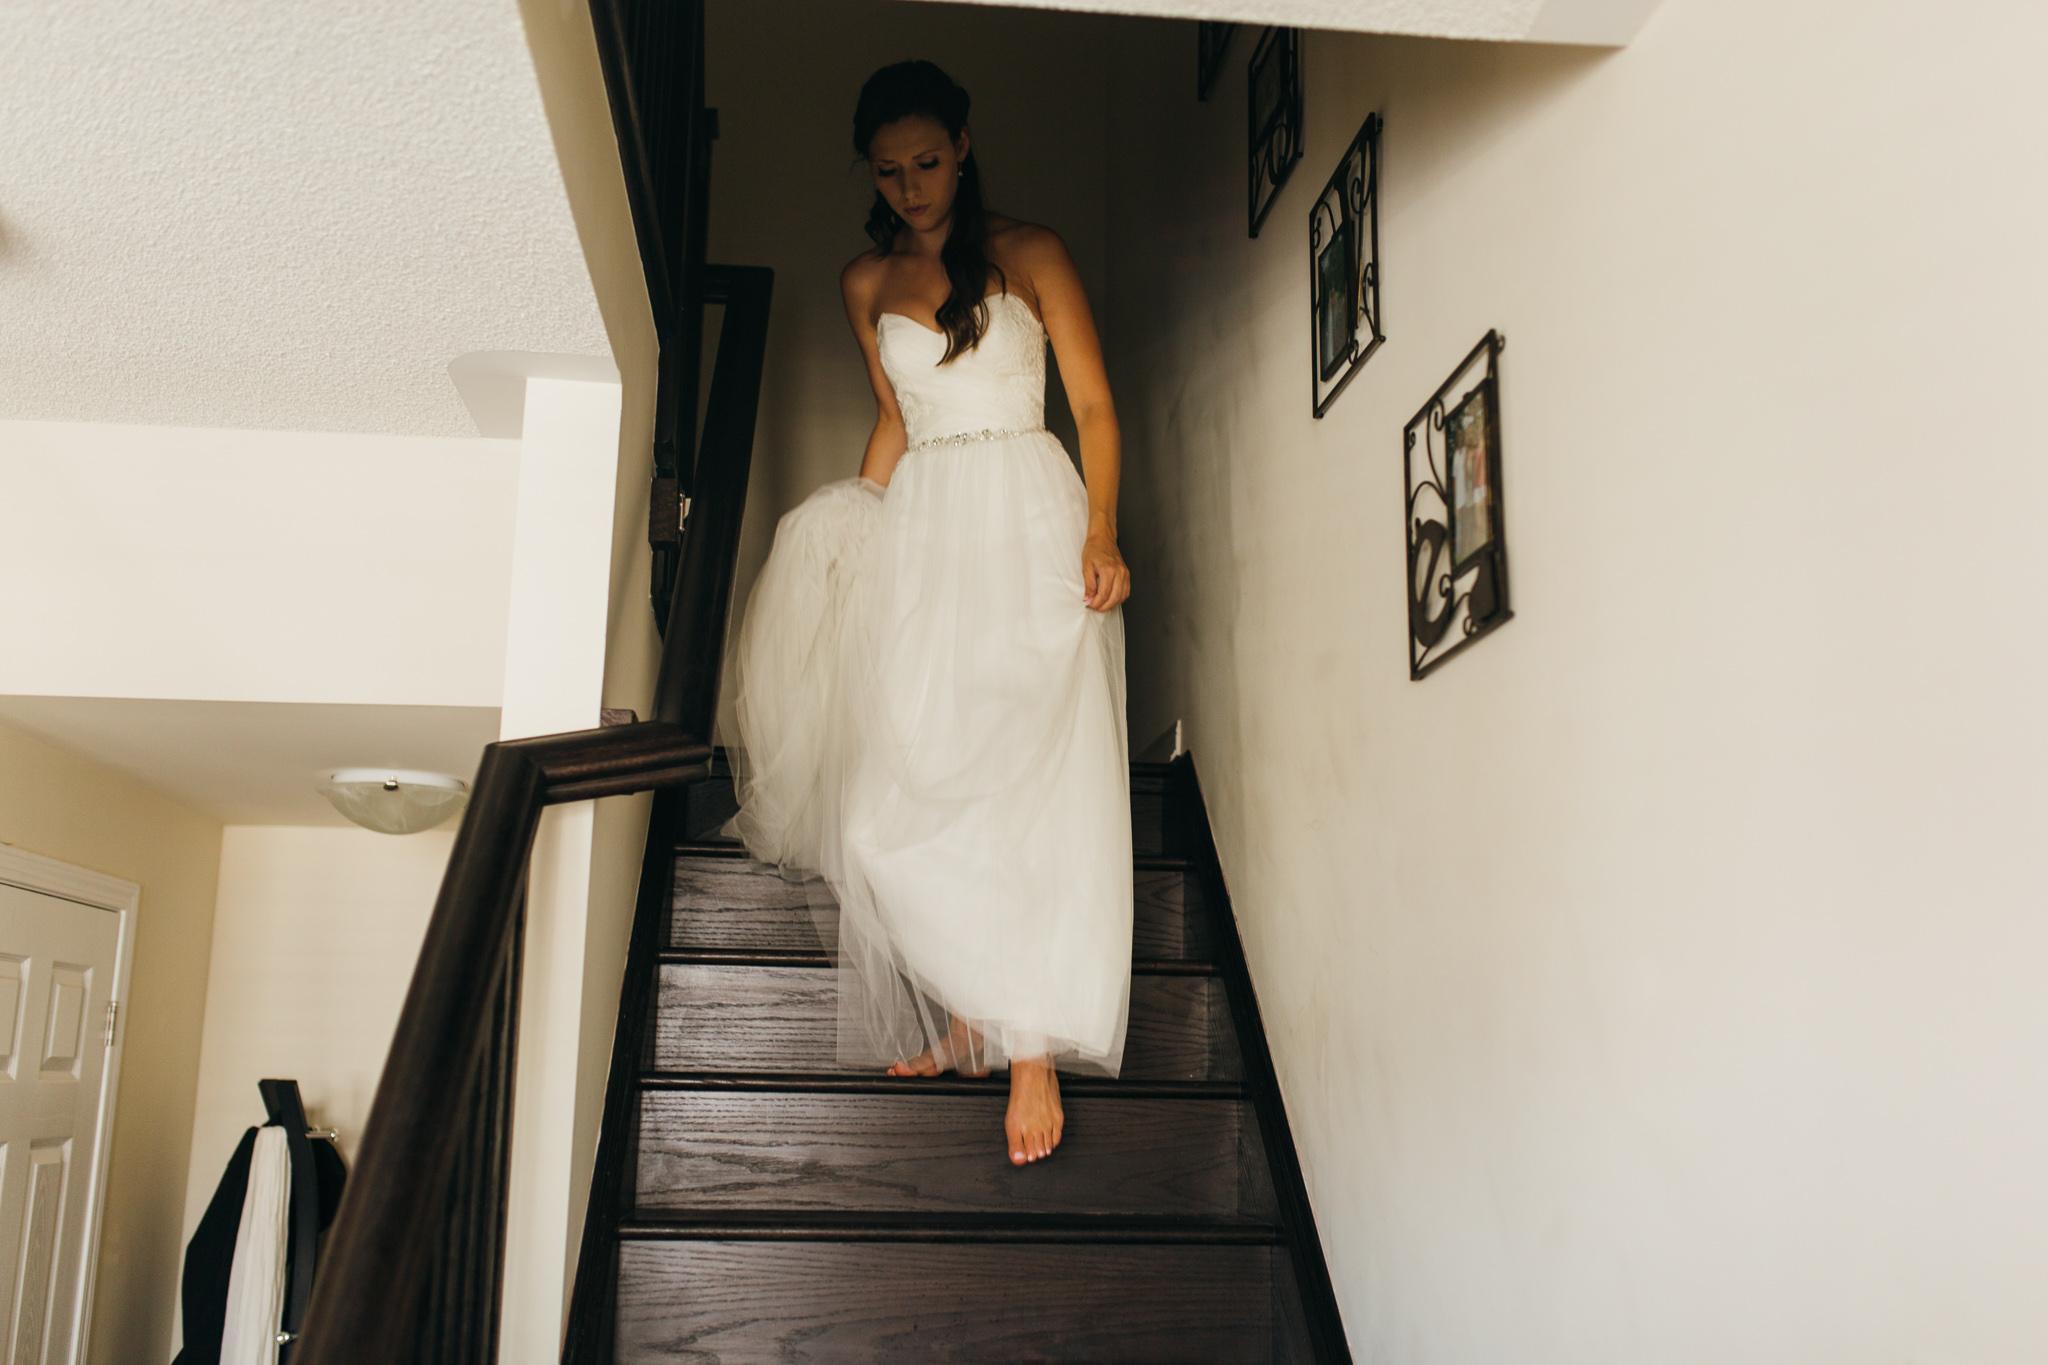 springer-house-burlington-wedding-photographer-155-of-756.jpg